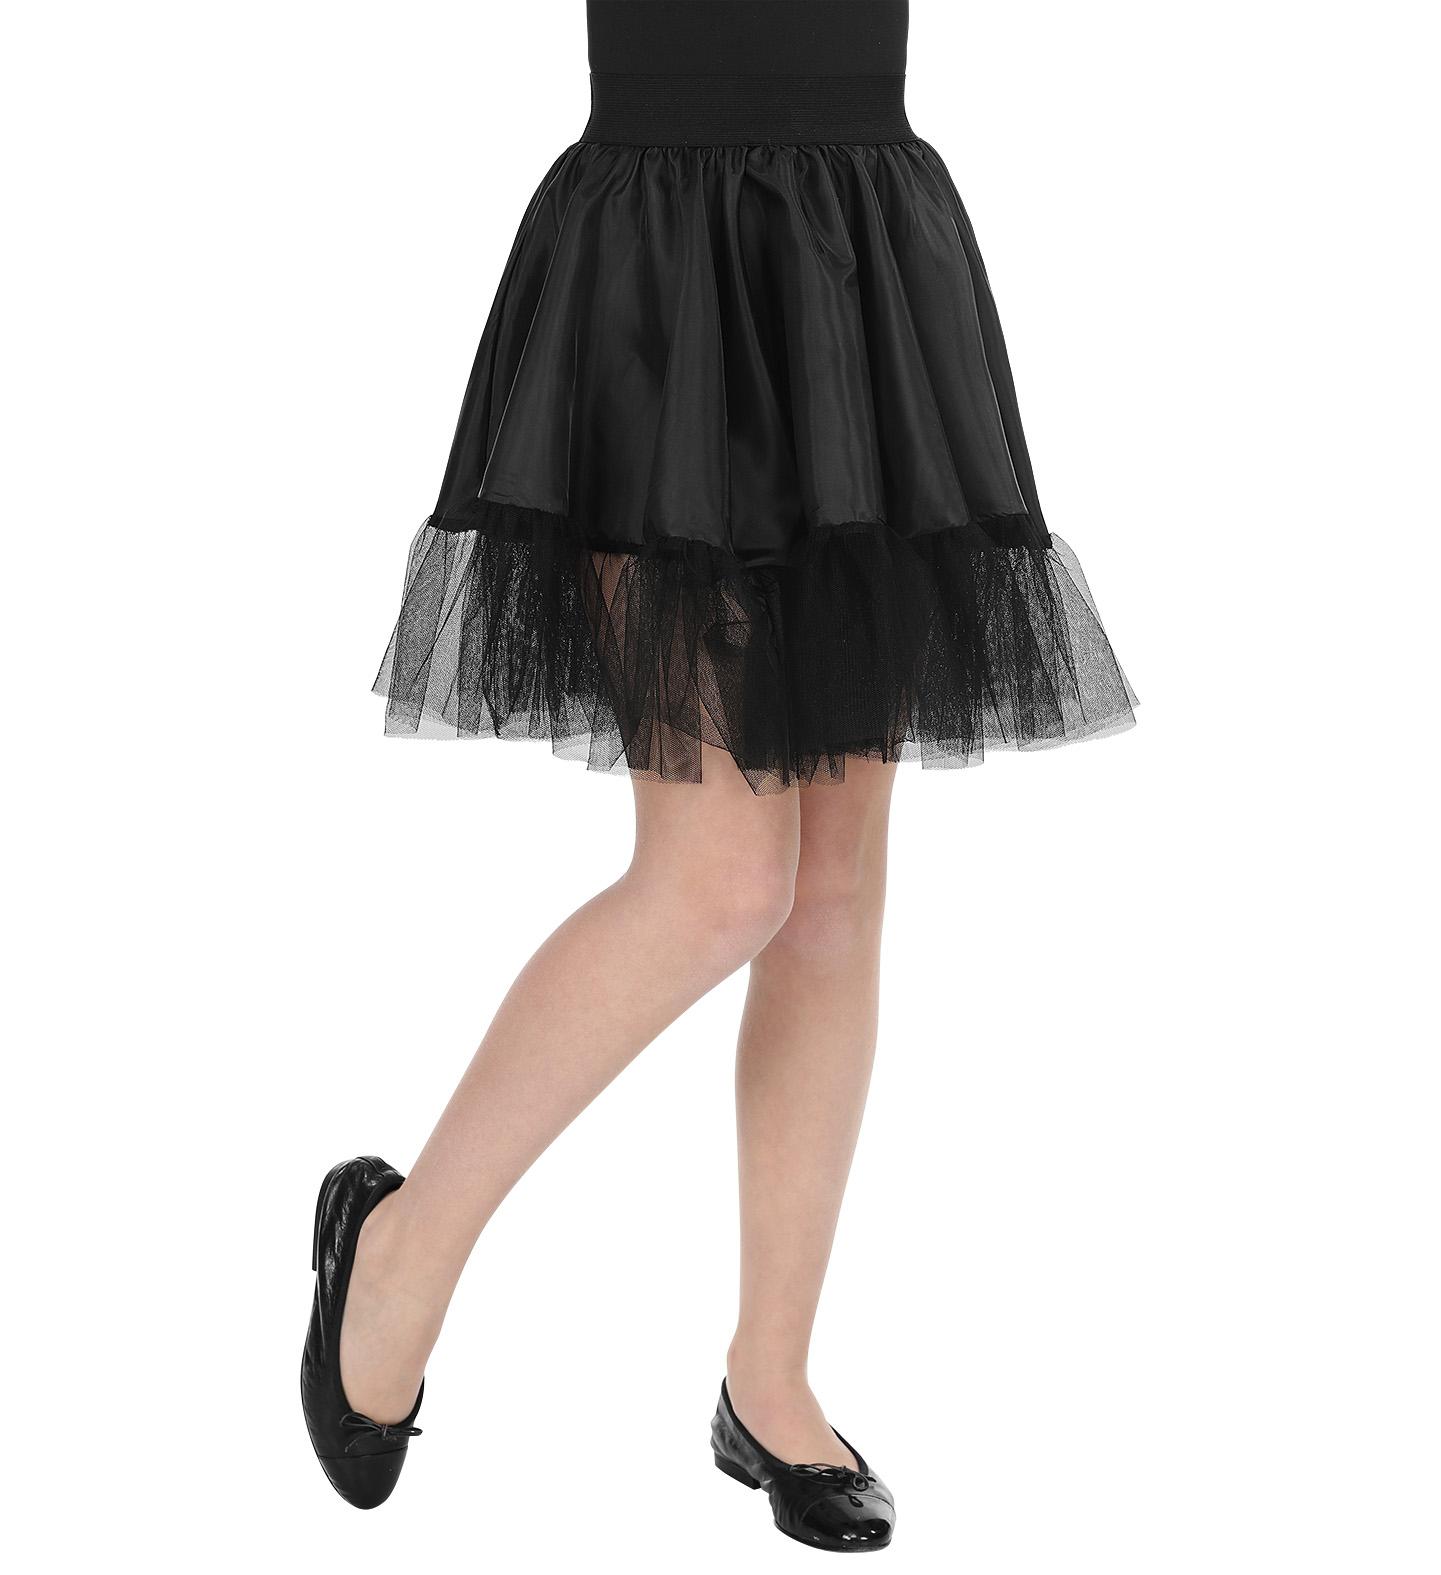 new concept ccfa5 3cc1a Satin Petticoat Unterrock, knielang, schwarz Tüll Tütü Kinder, Mädchen